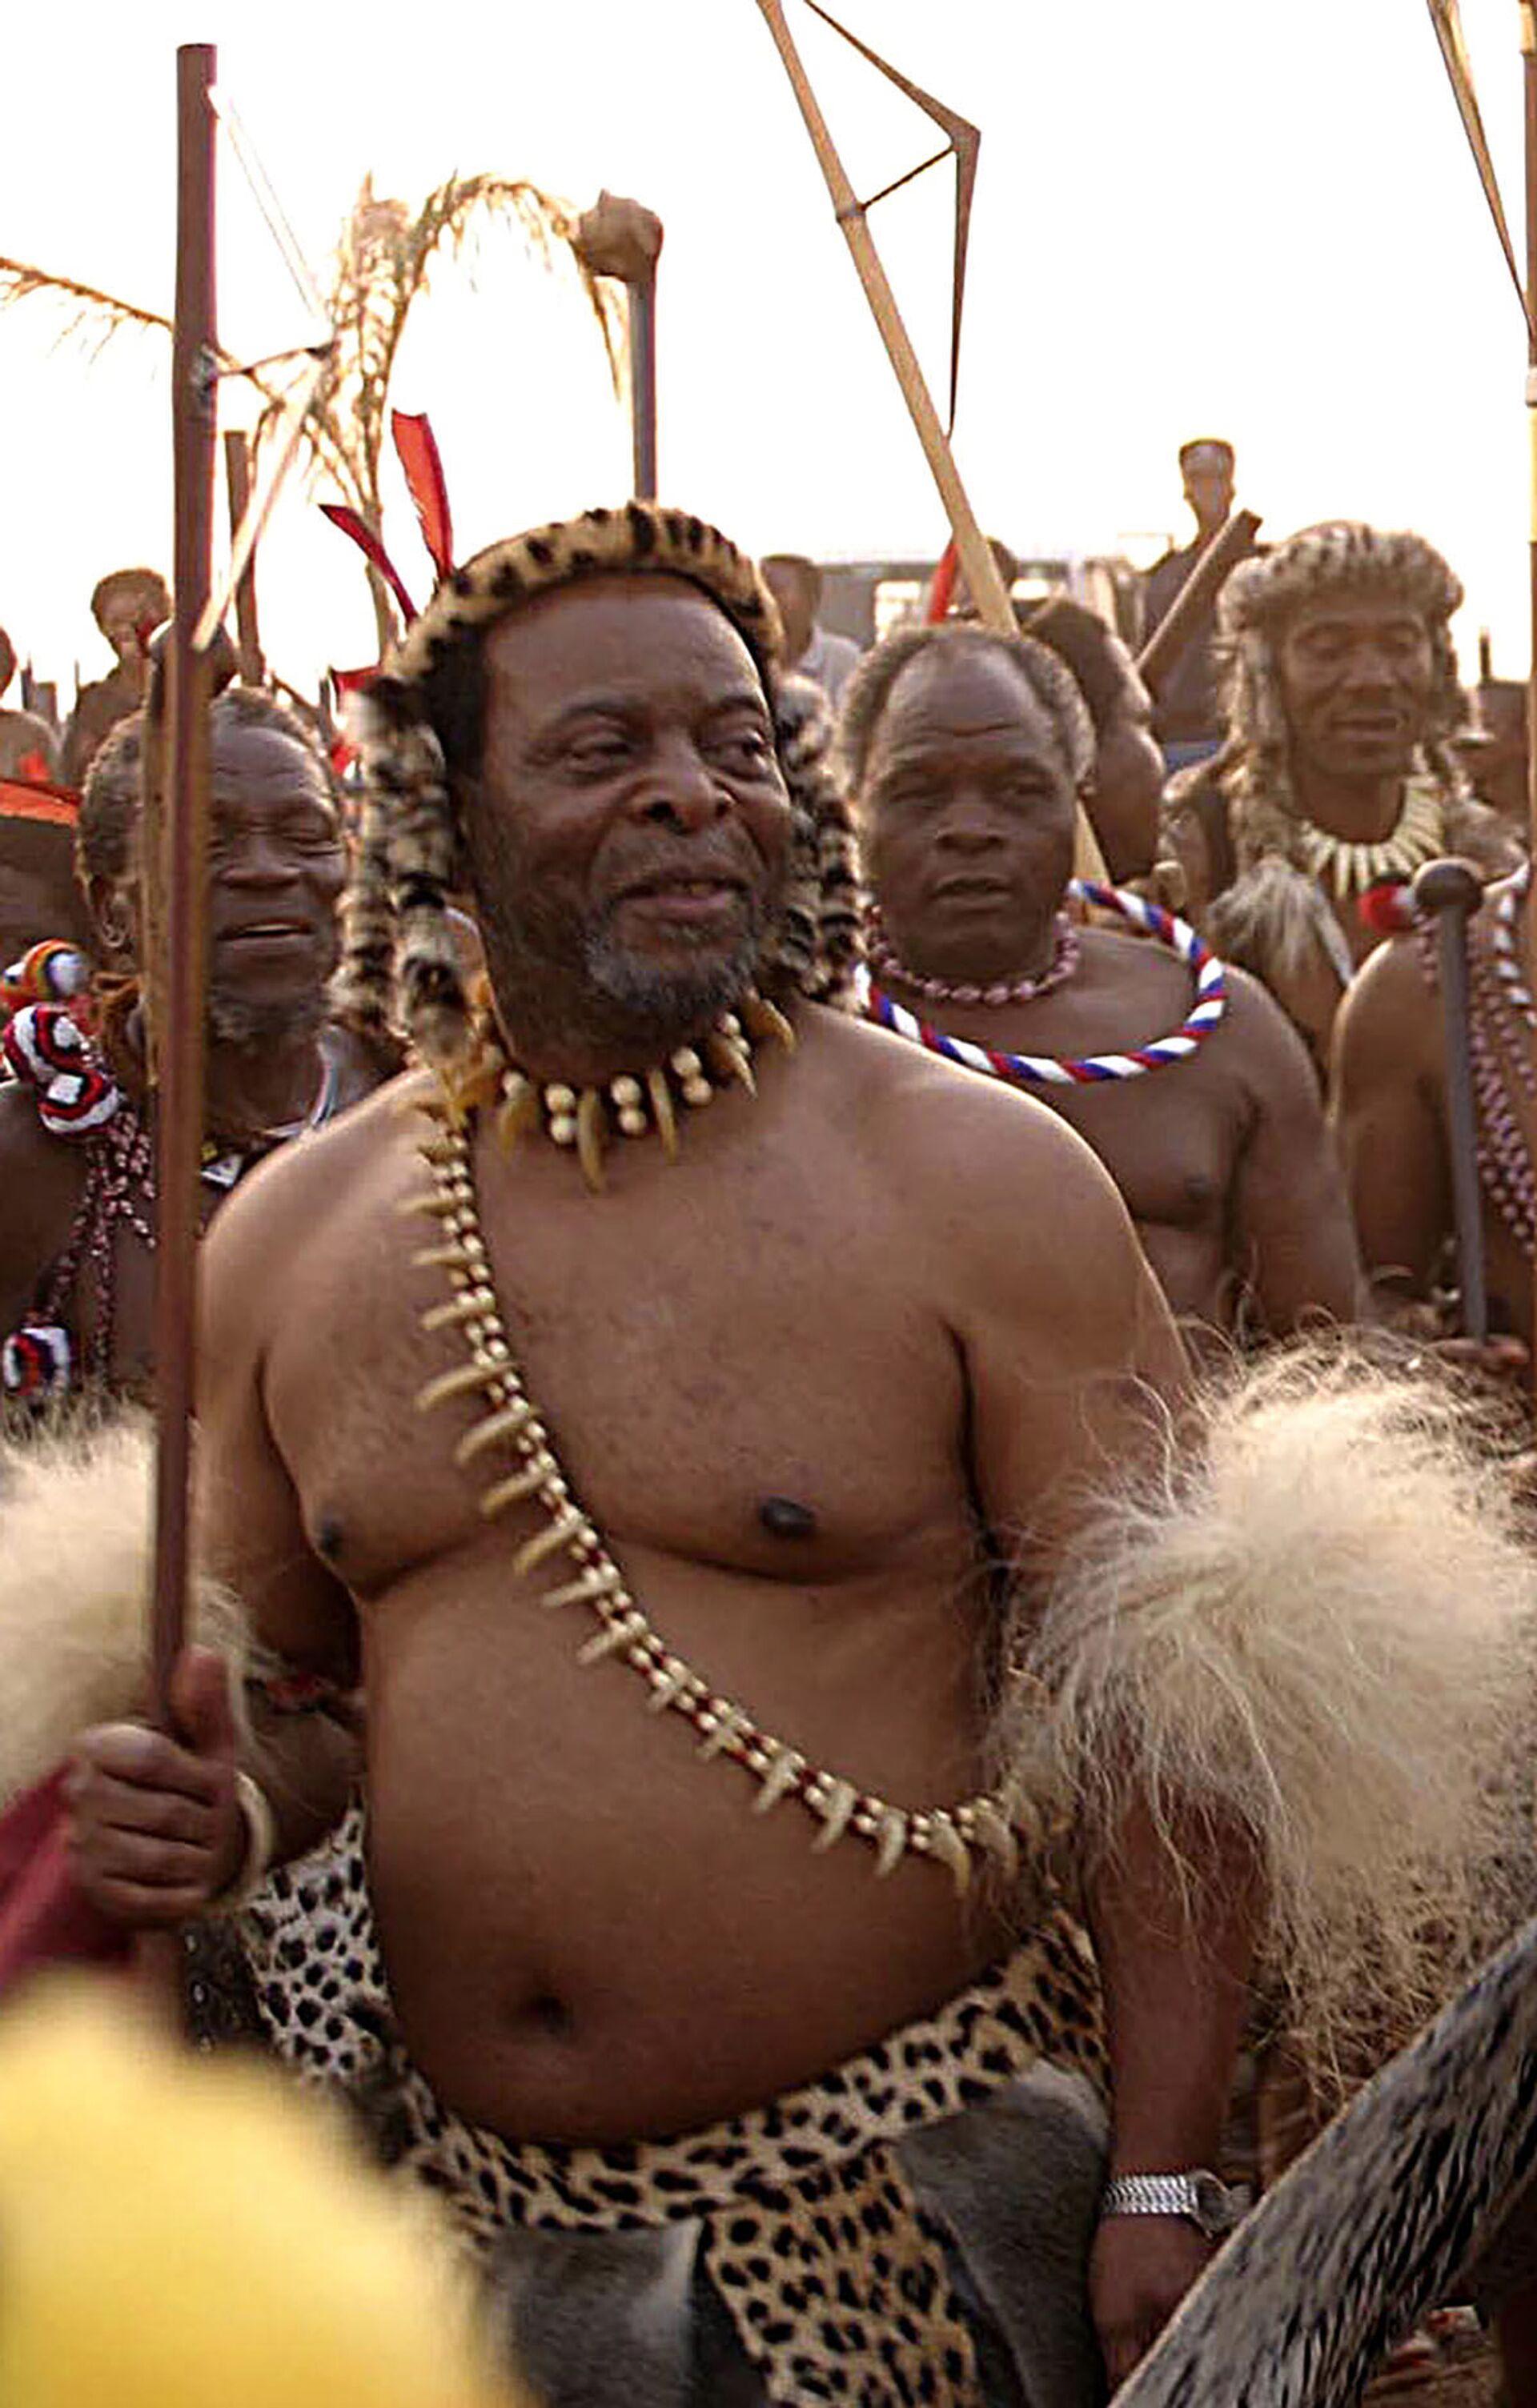 In Sudafrica si è spento il re degli Zulù - Sputnik Italia, 1920, 12.03.2021